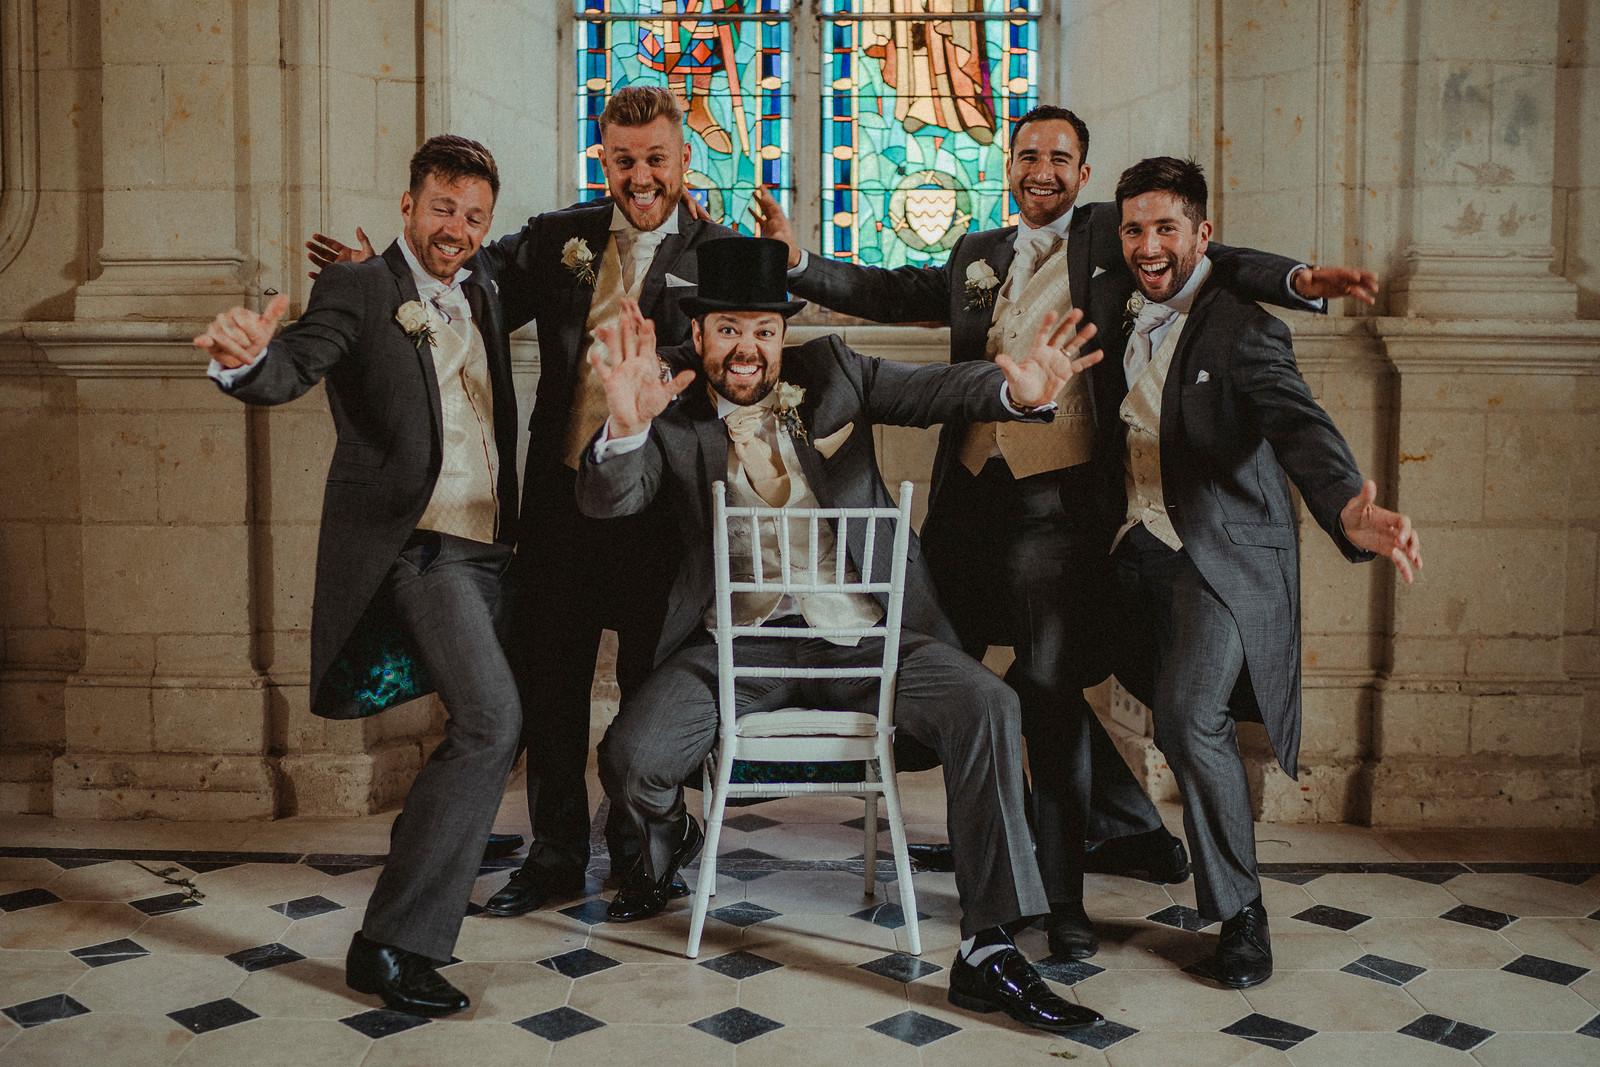 Fun groom photo with his groomsmen